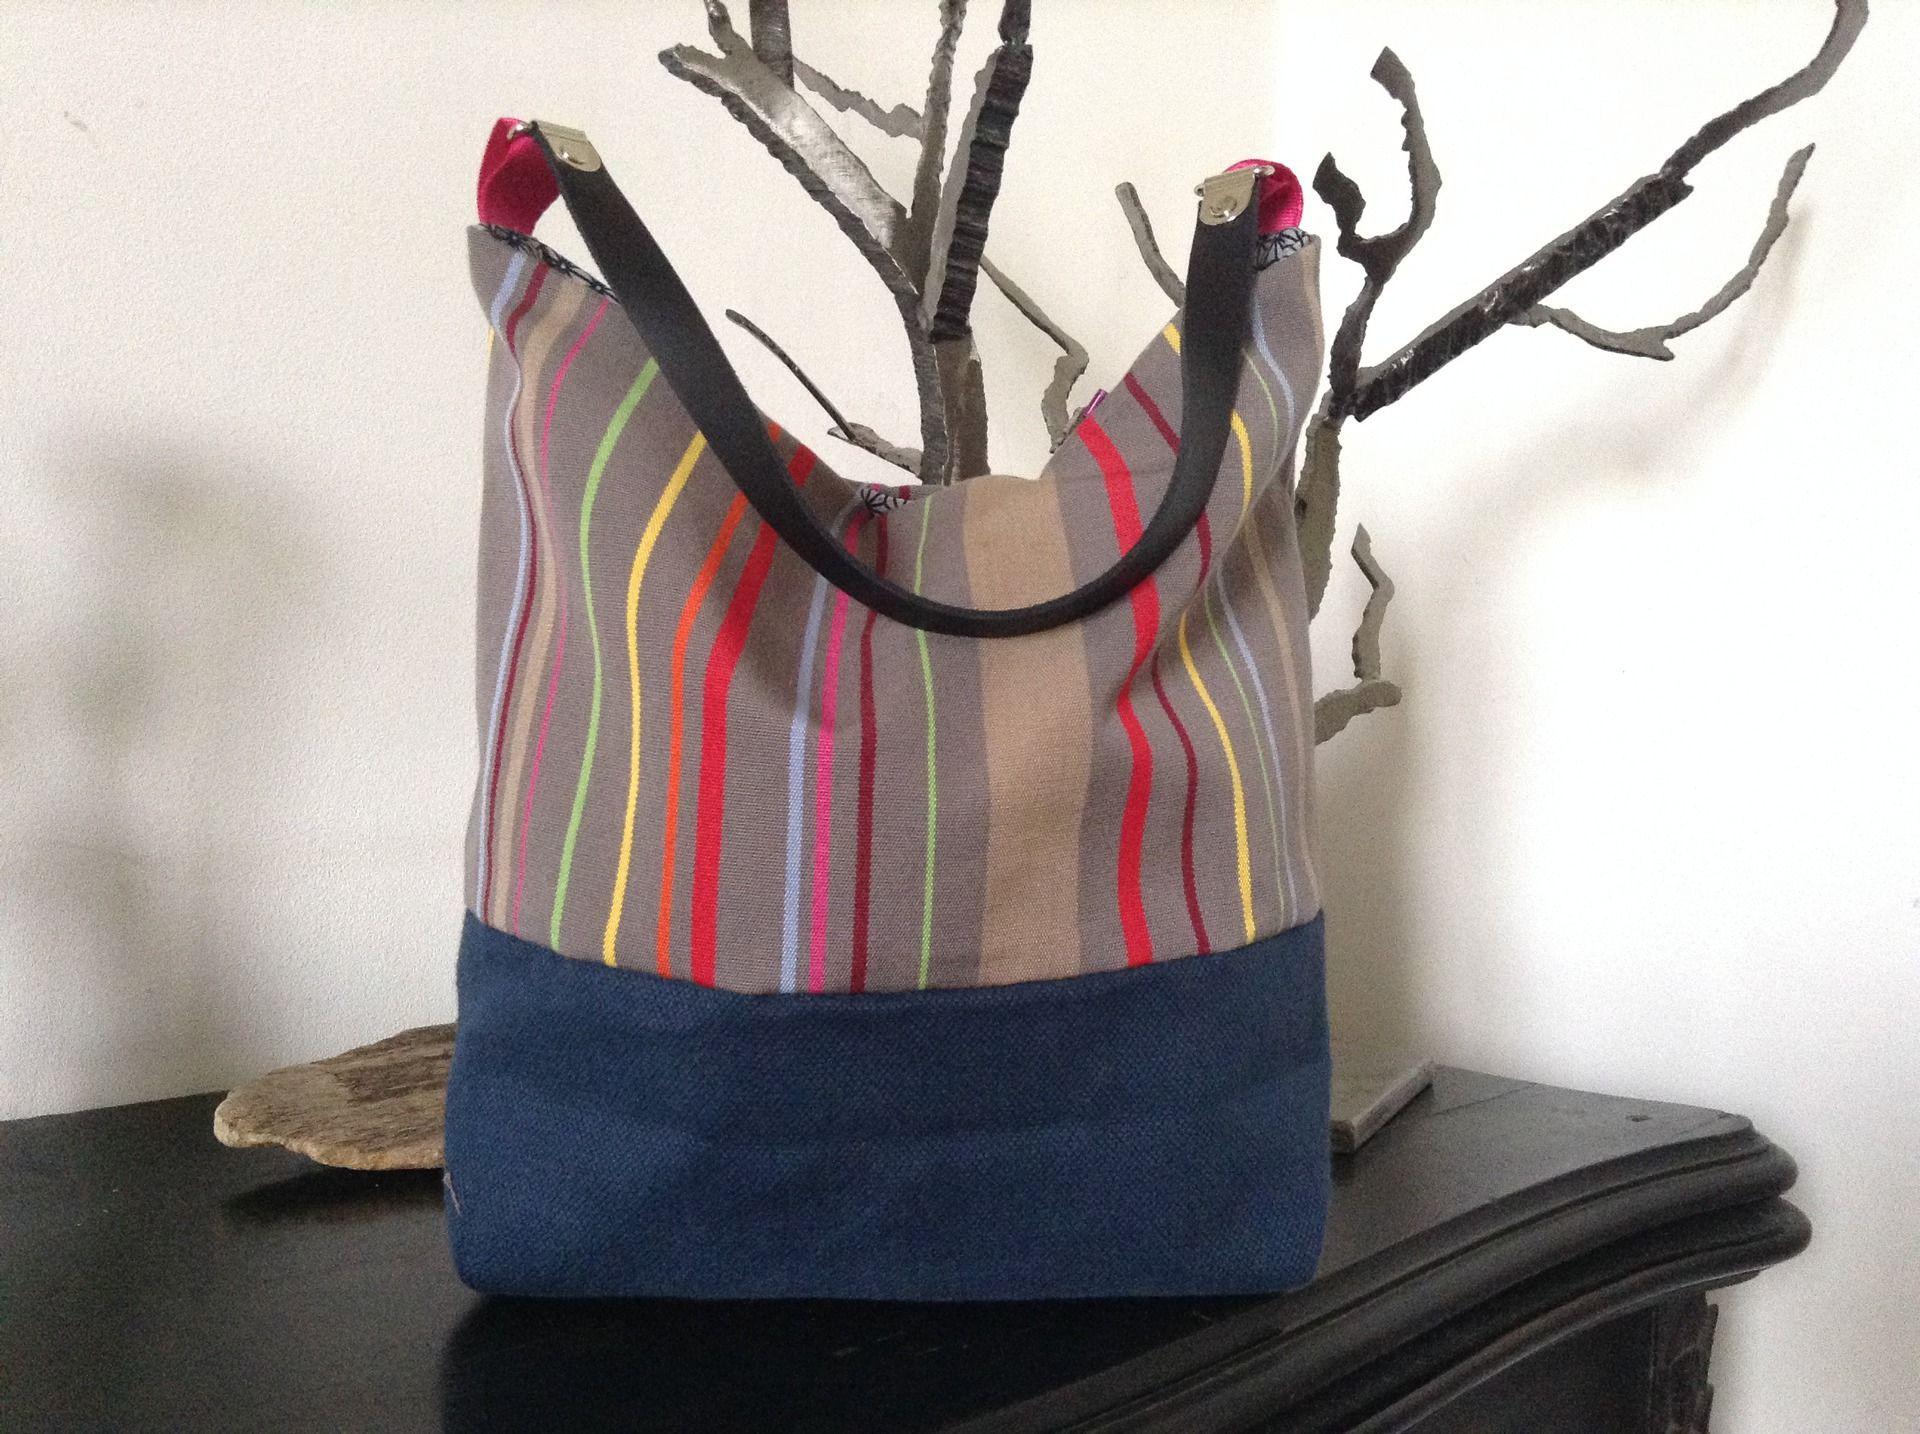 sac a main tendance fourre tout bayaderes basques gris. Black Bedroom Furniture Sets. Home Design Ideas